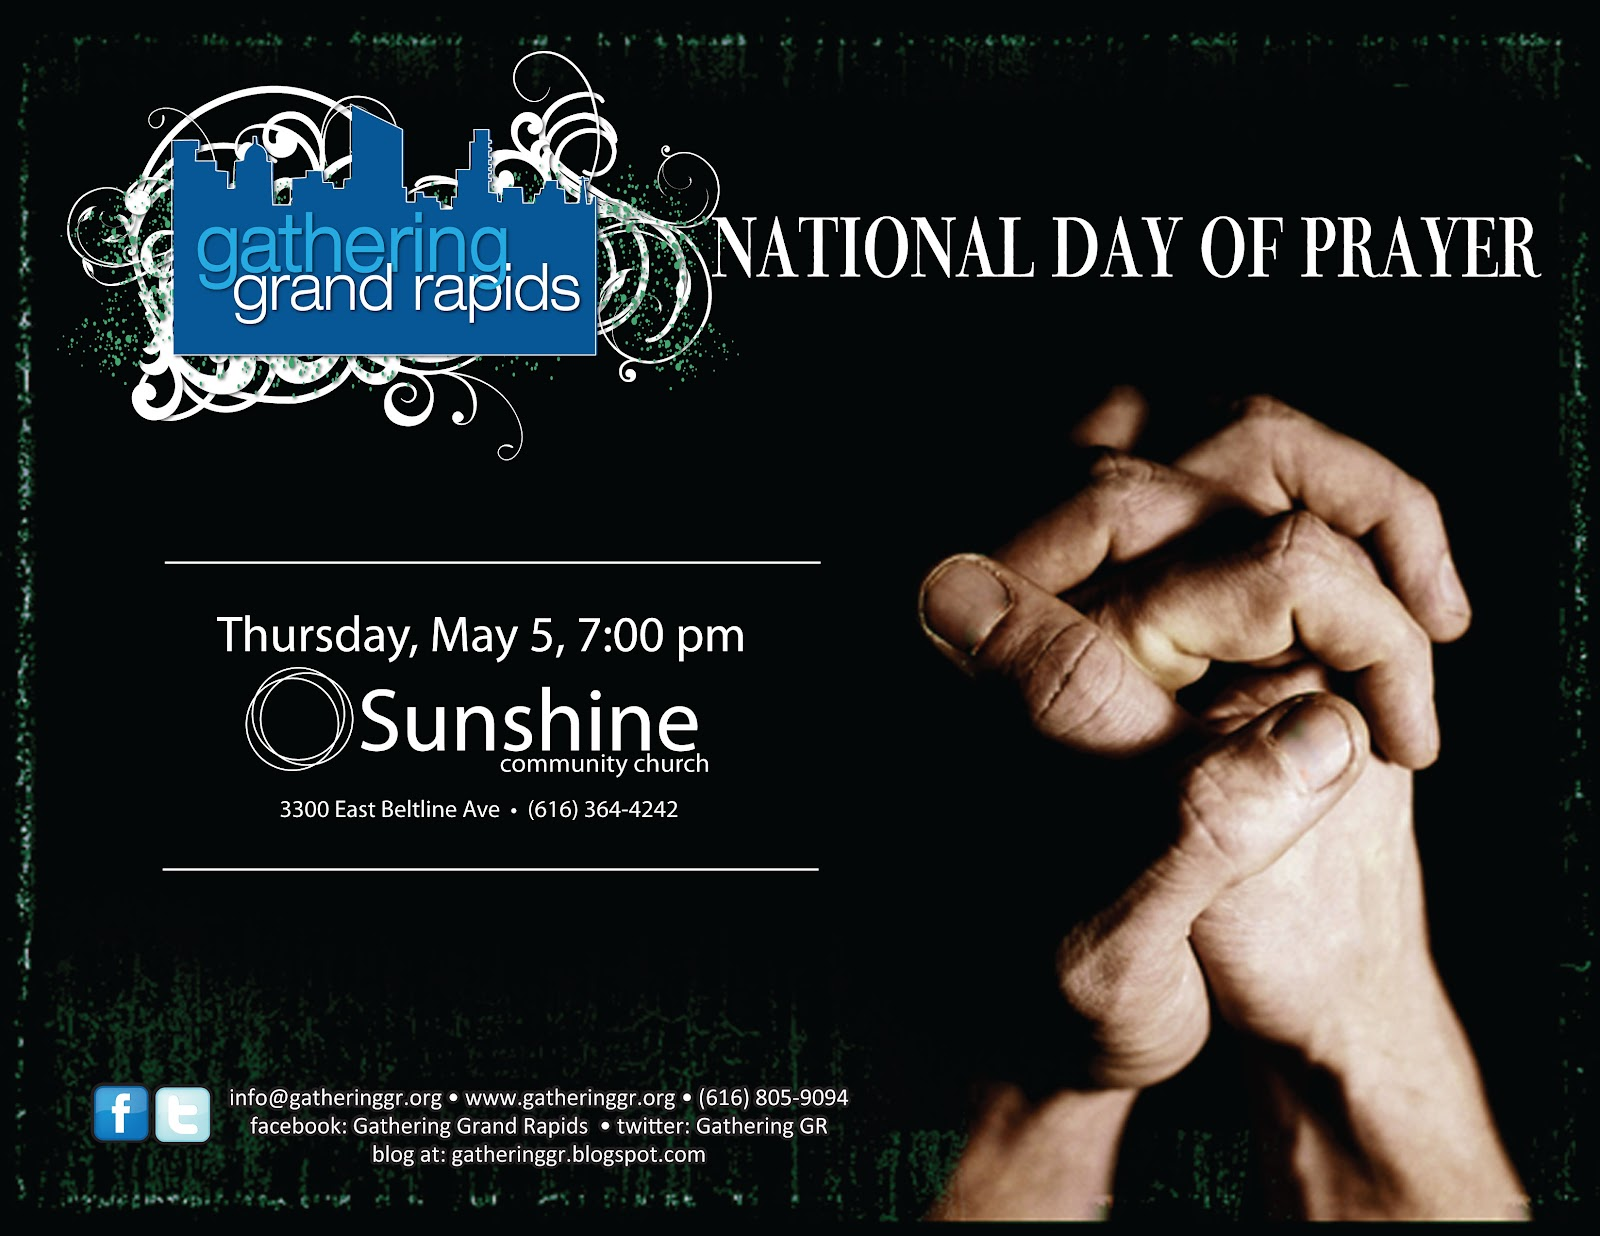 national day of prayer prayer guide